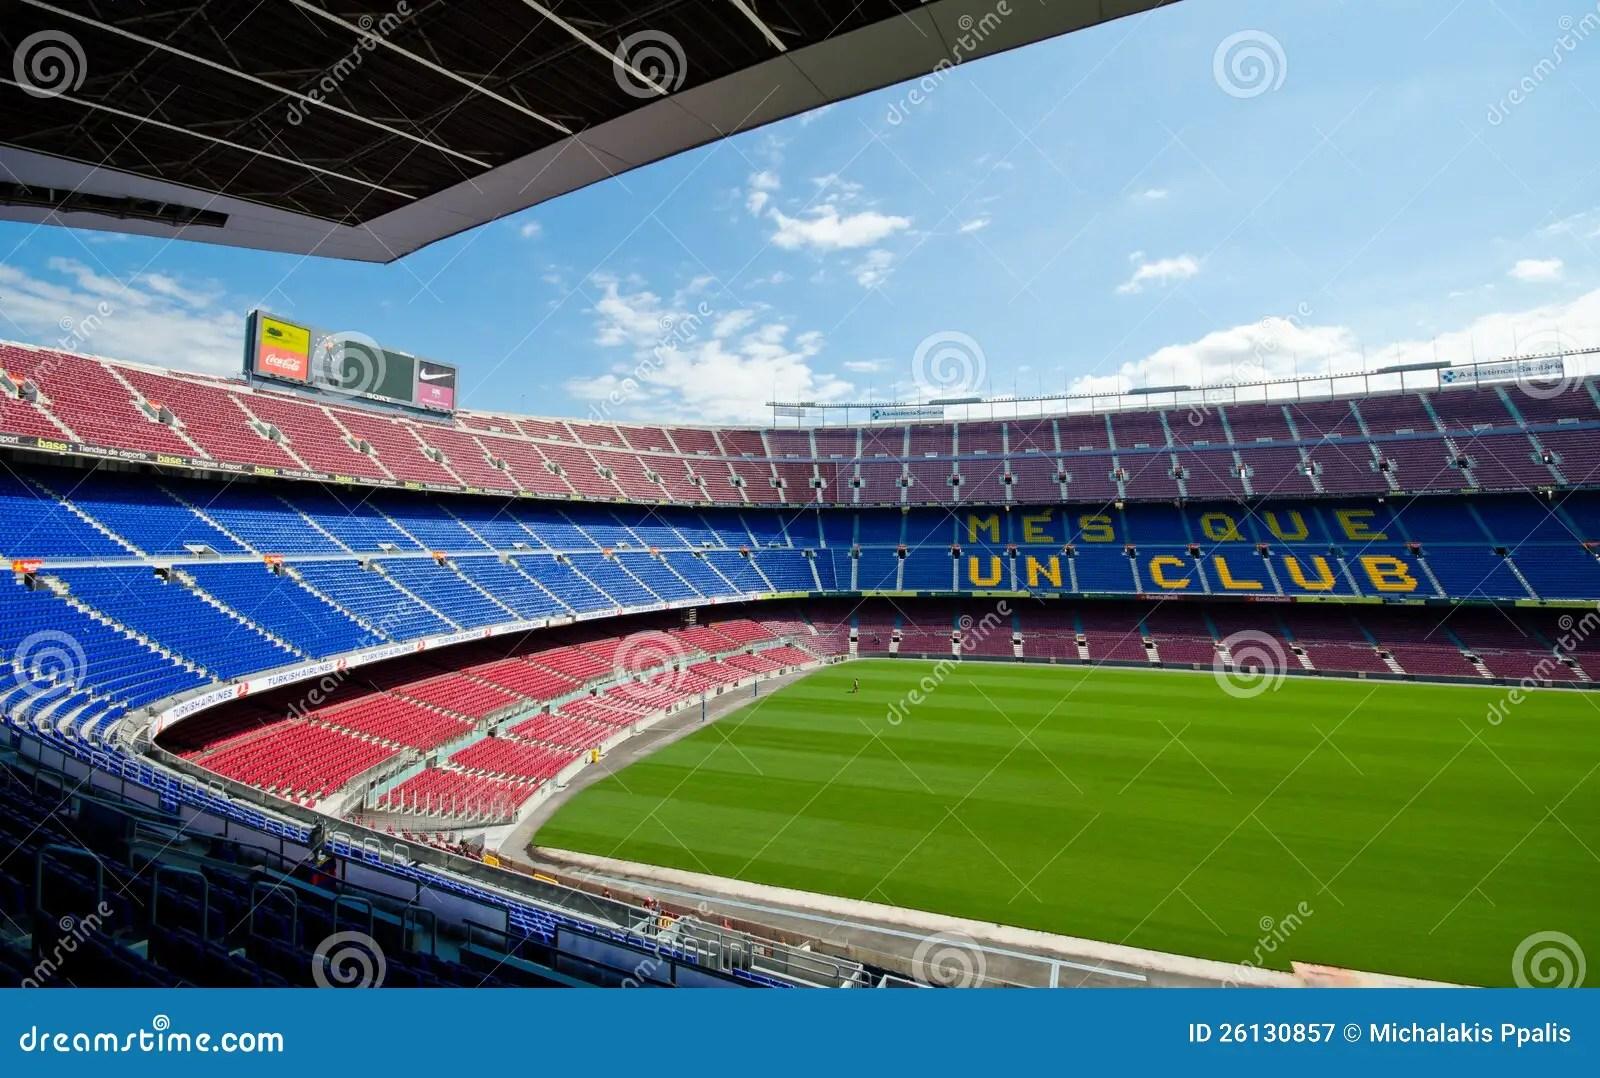 Wallpaper Barcelona Fc 3d Camp Nou Barcelona Stadium Editorial Photography Image